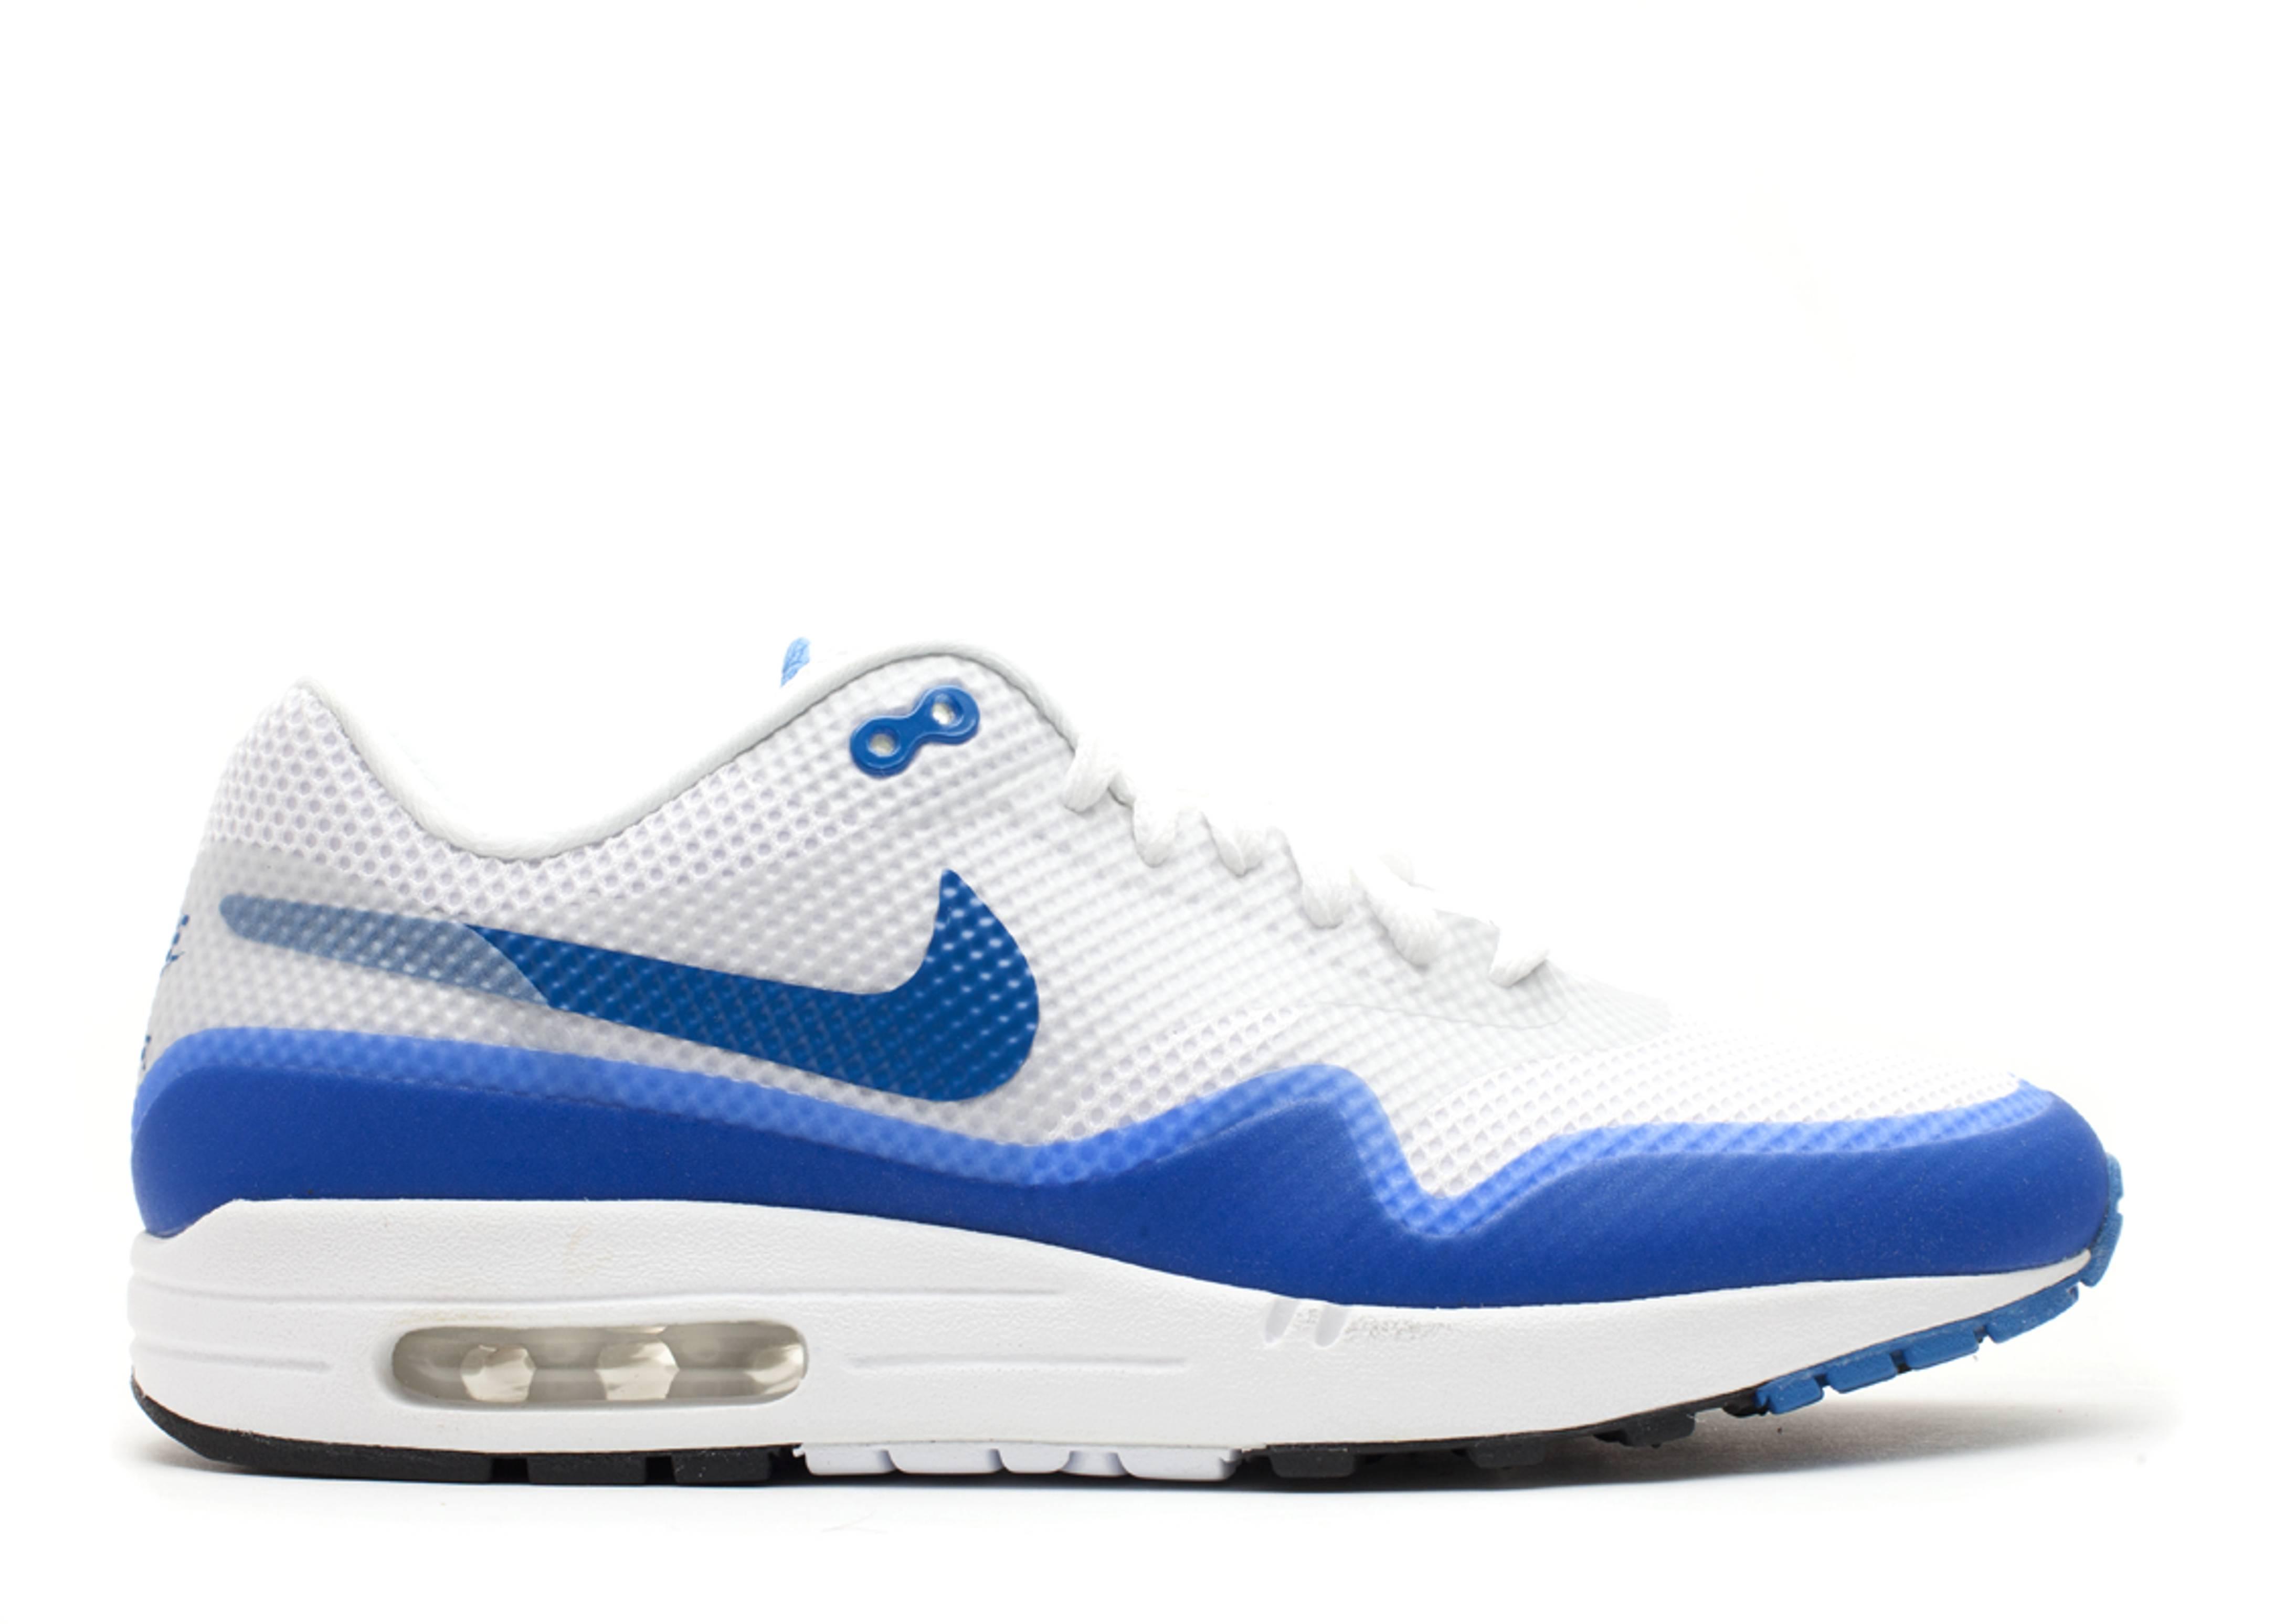 air max 1 hyperfuse white/varsity blue-neutral grey